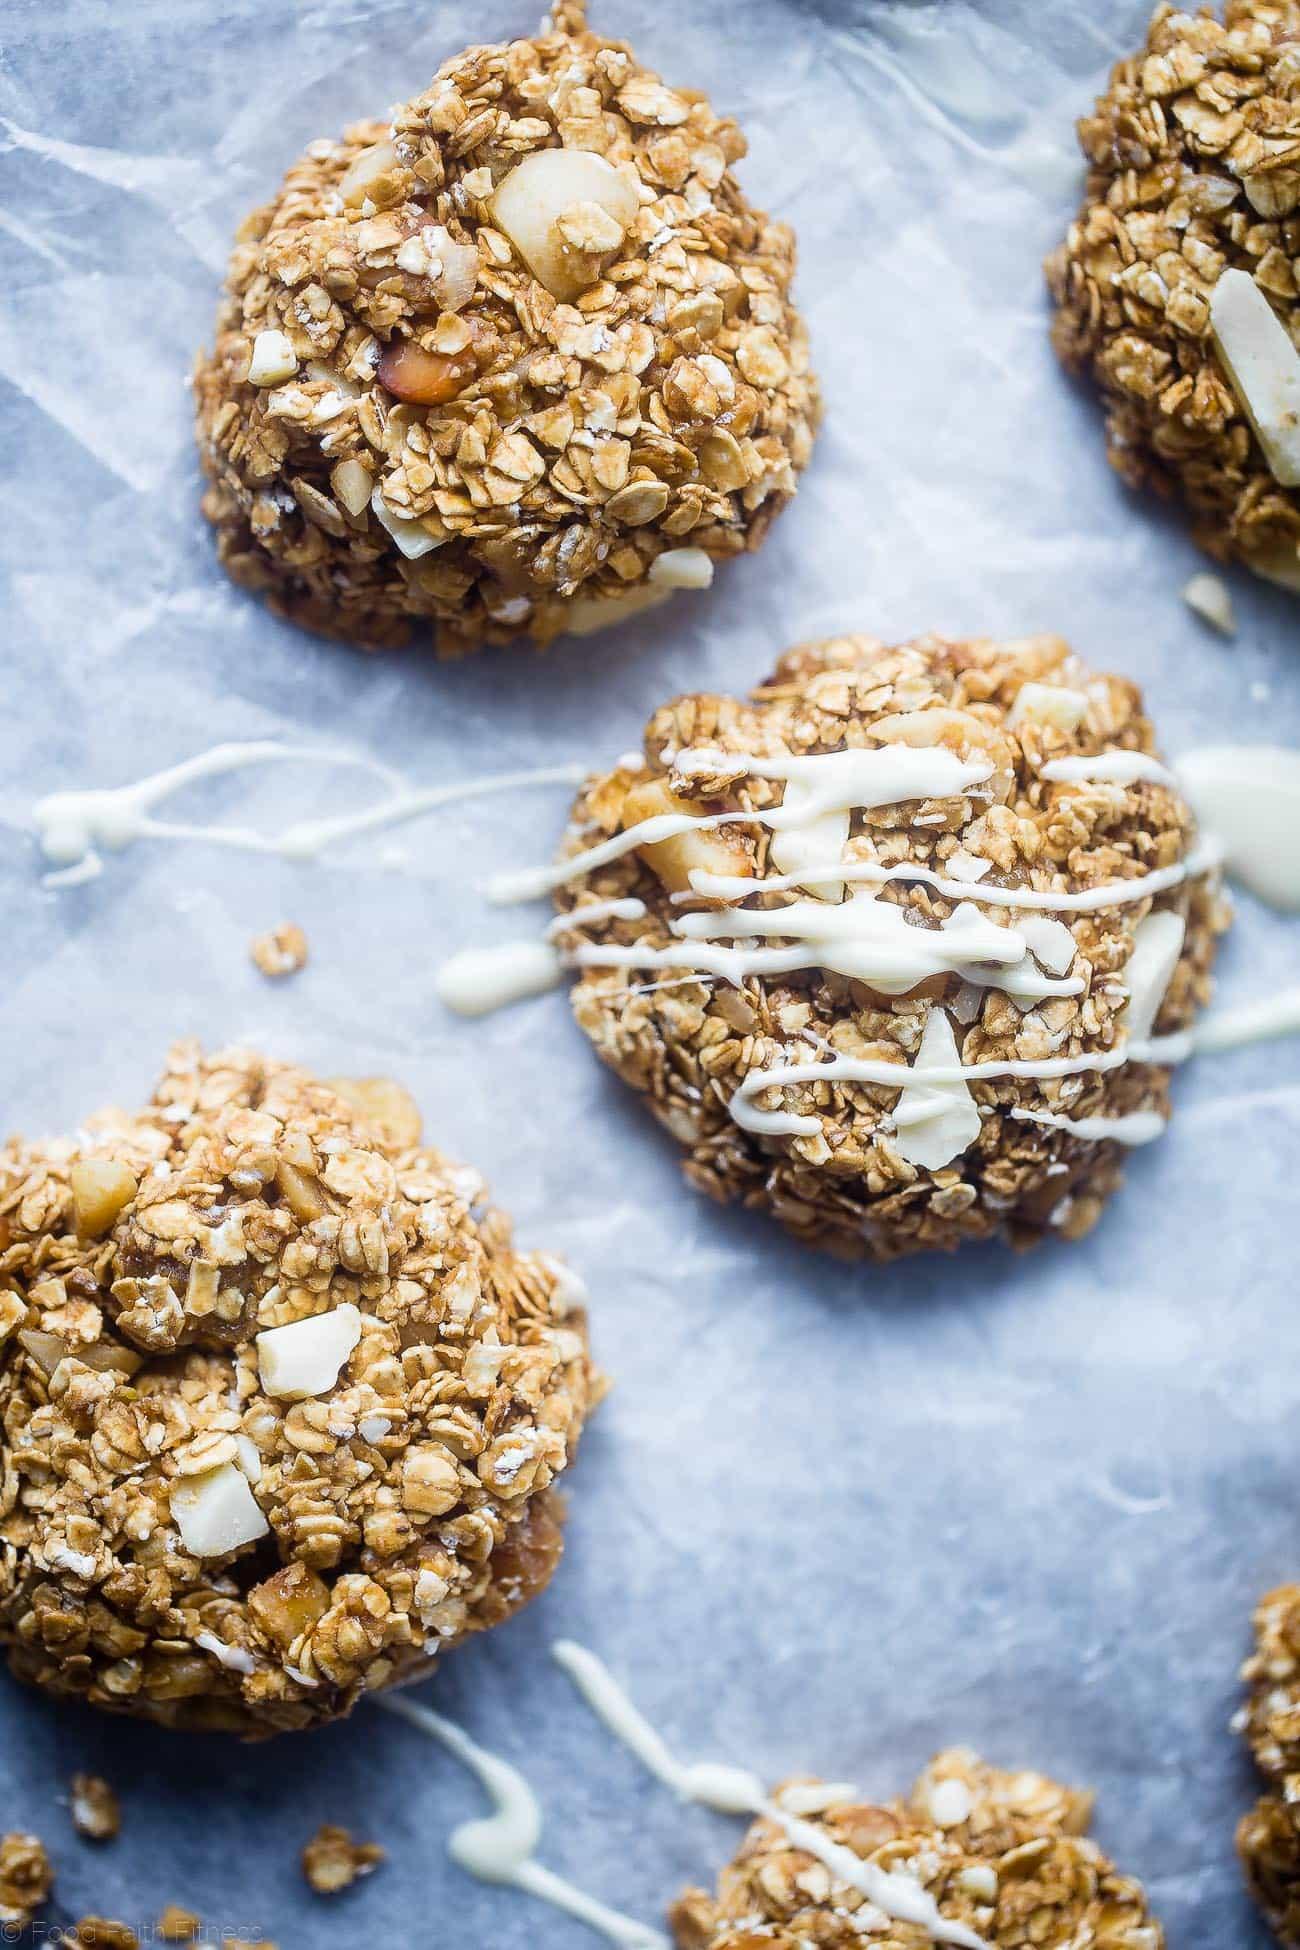 White chocolate drizzled onto no bake white chocolate macadamia nut cookies. Recipe on Foodfaithfitness.com